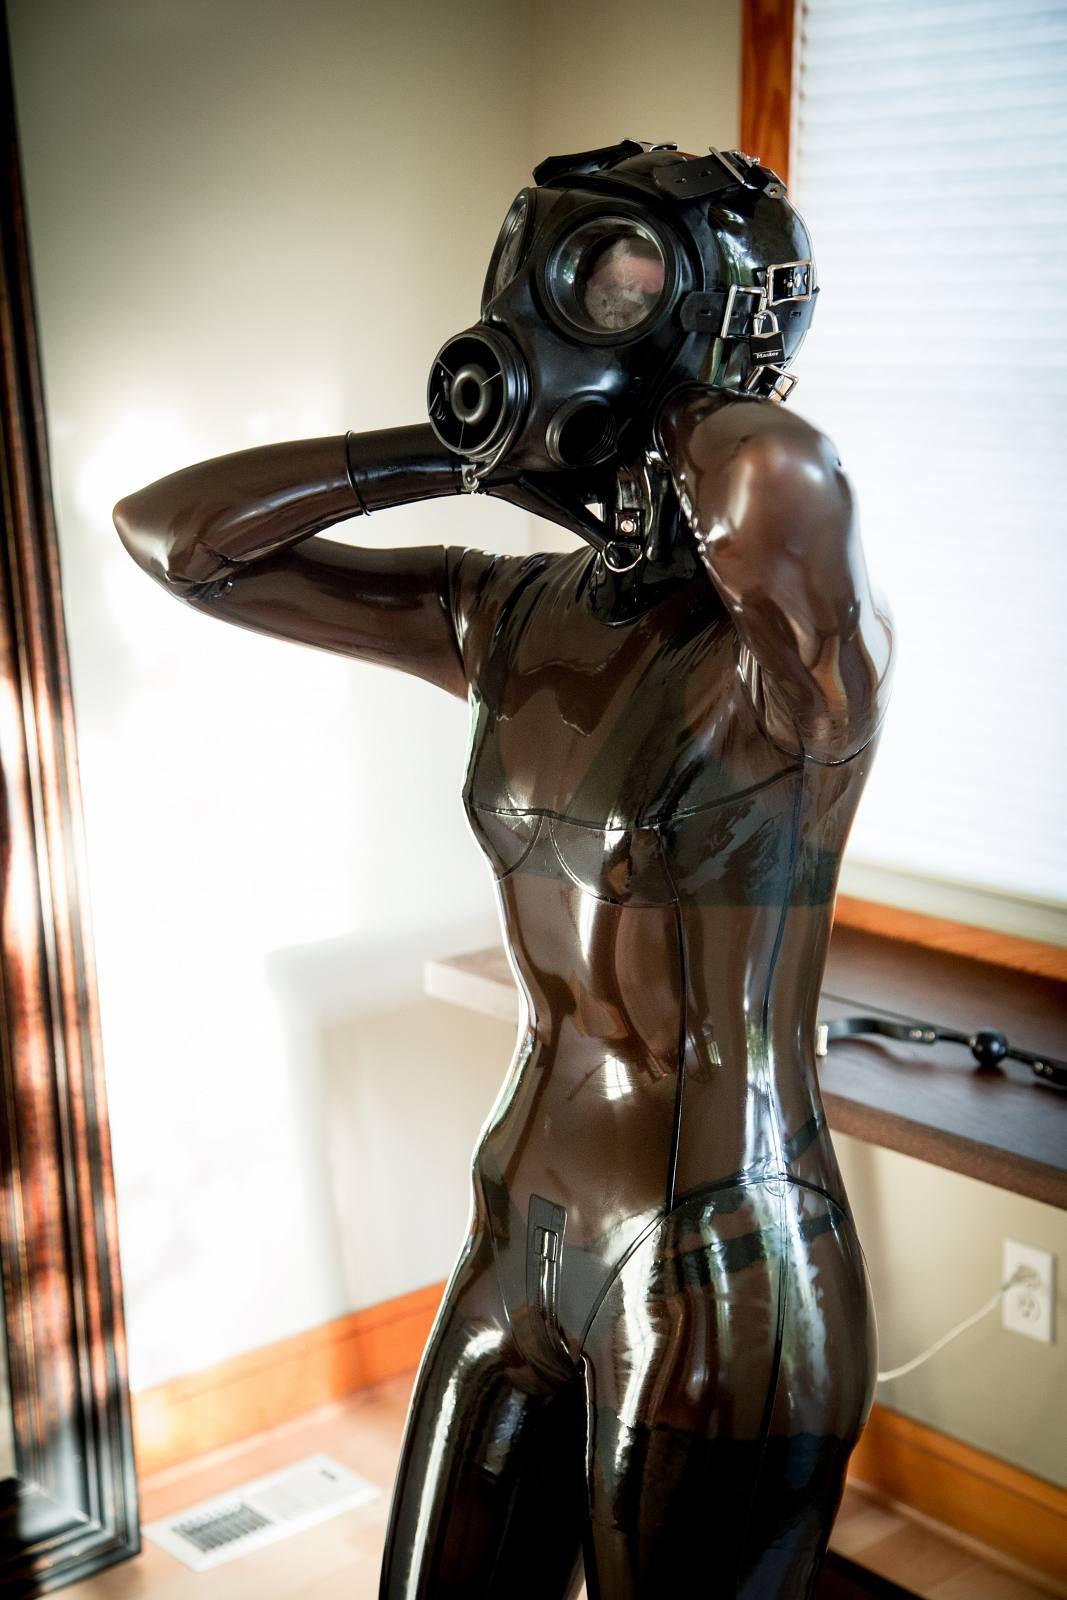 Final fantasy girl nude